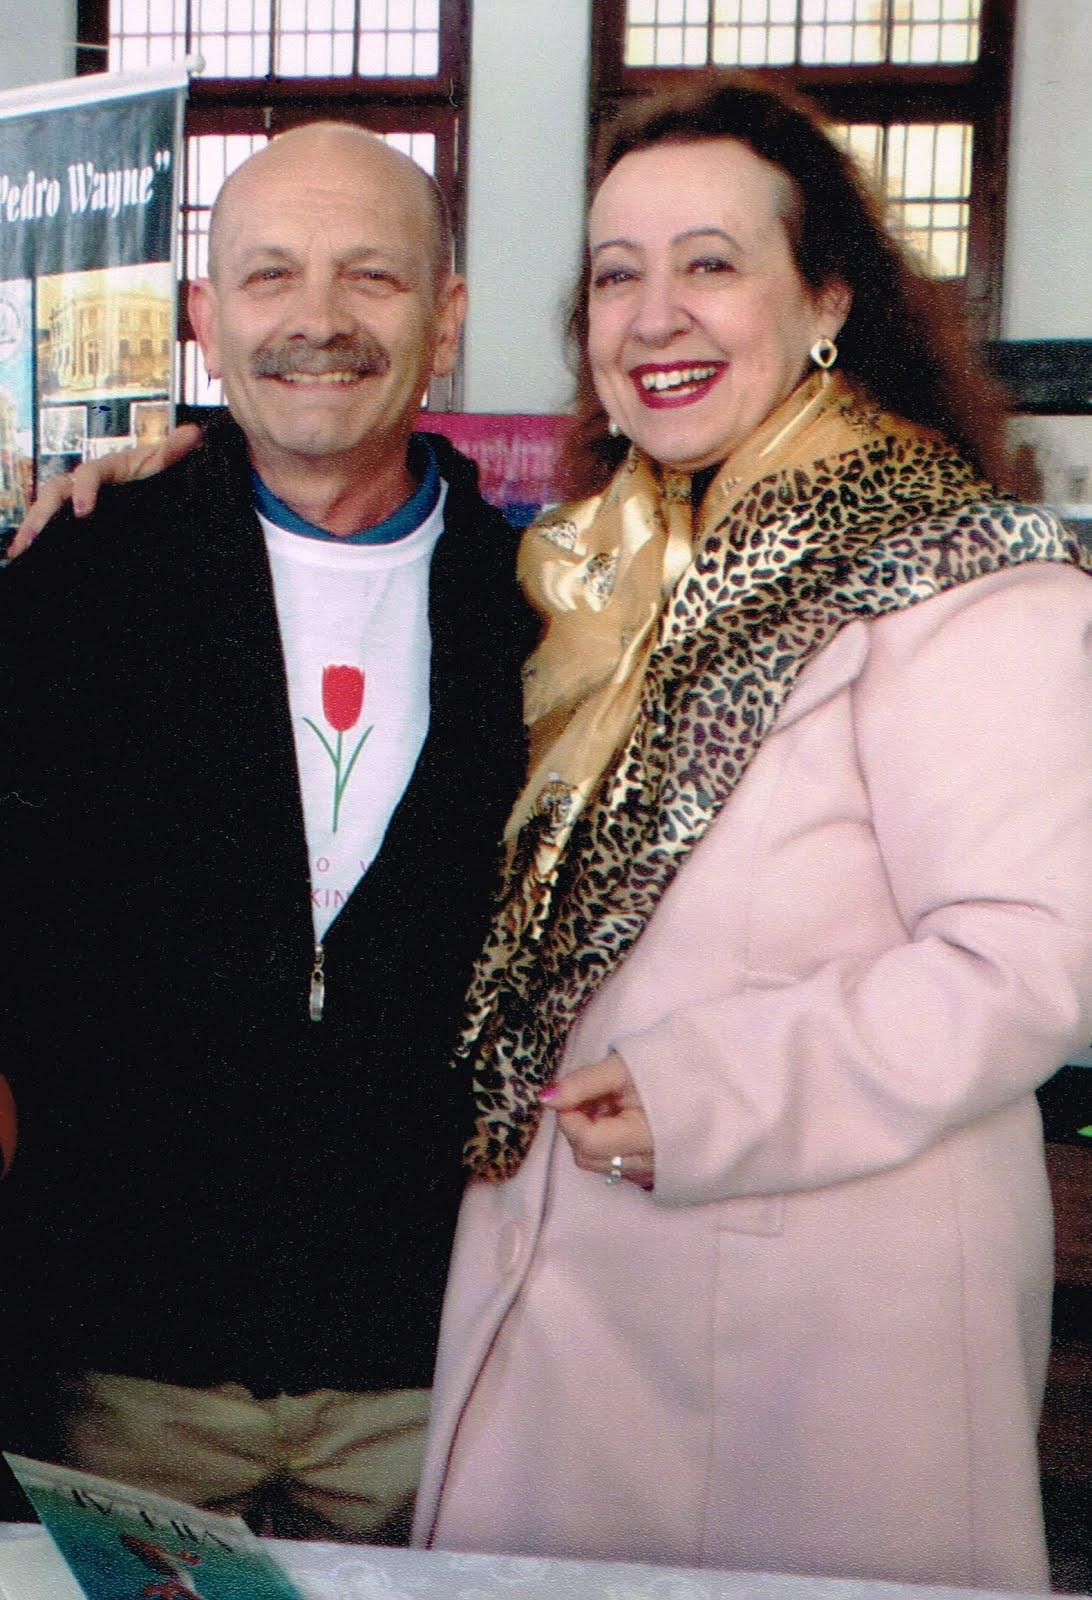 Manoel Ianzer e Marcia Duro Mello